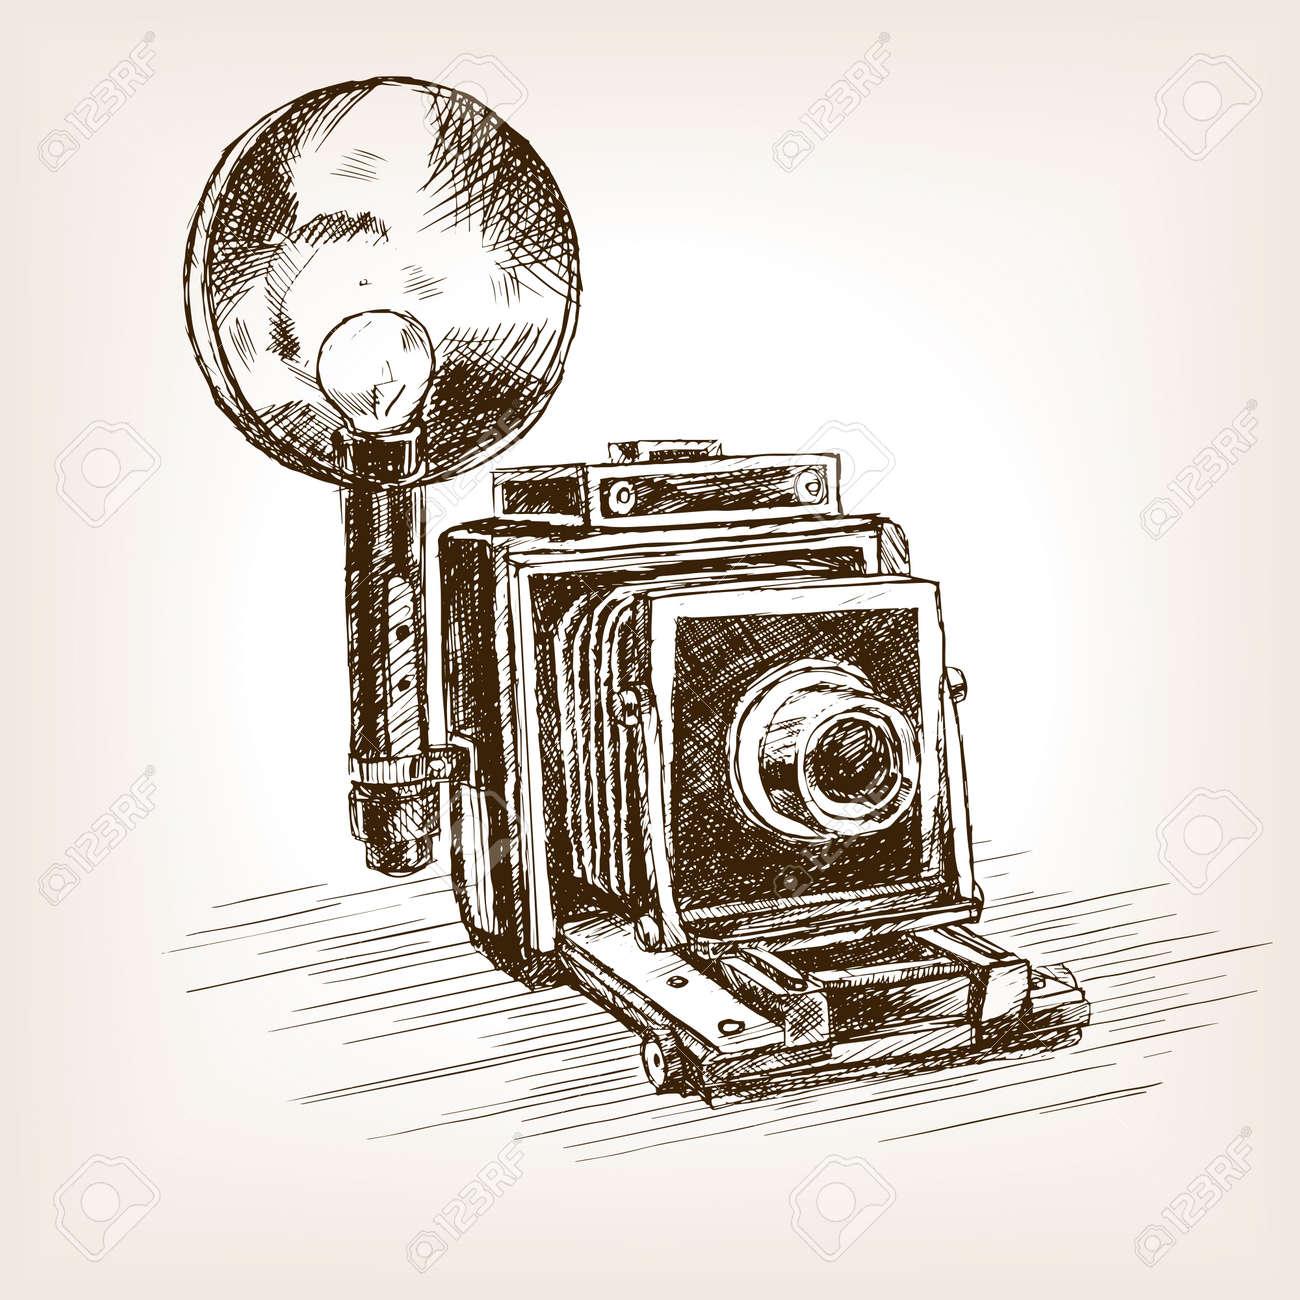 Old photo camera sketch style vector illustration. Old hand drawn engraving imitation. - 51266087